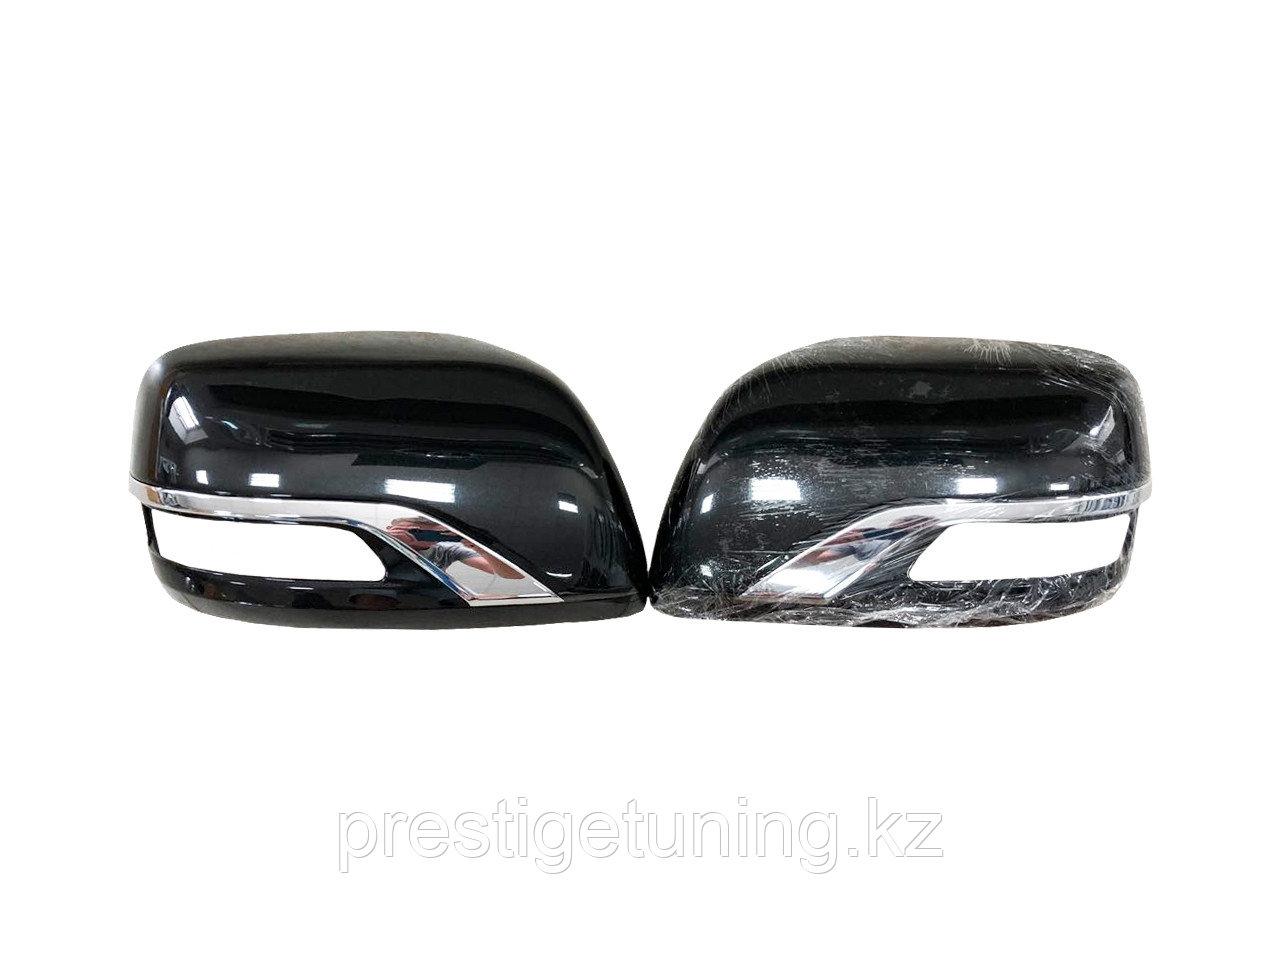 Корпуса зеркал executive black/white Land Cruiser 200 2012-21